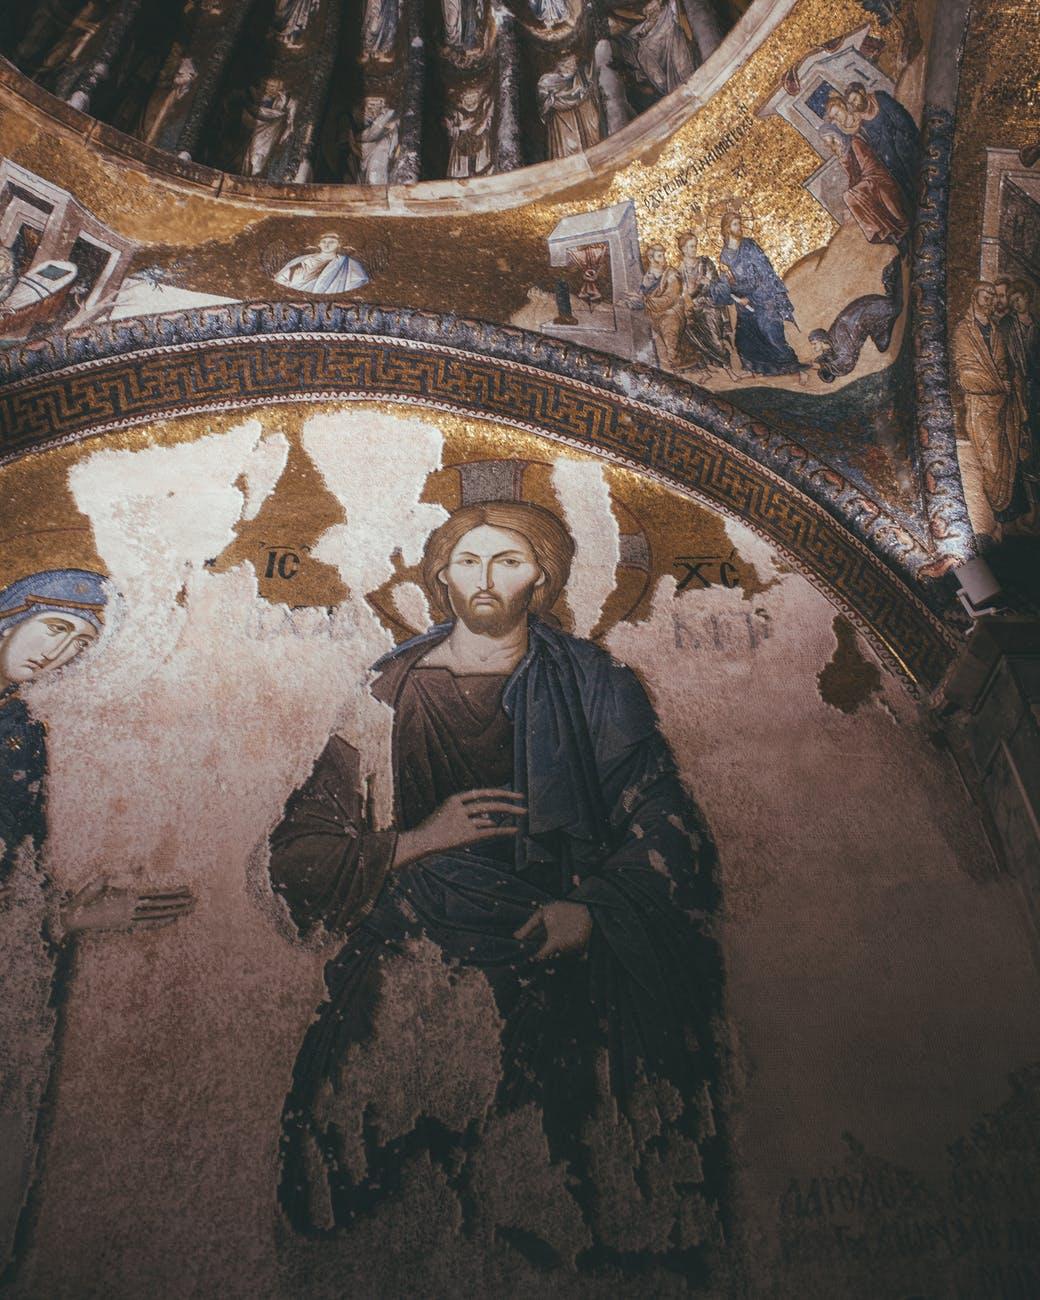 religious wall art inside building